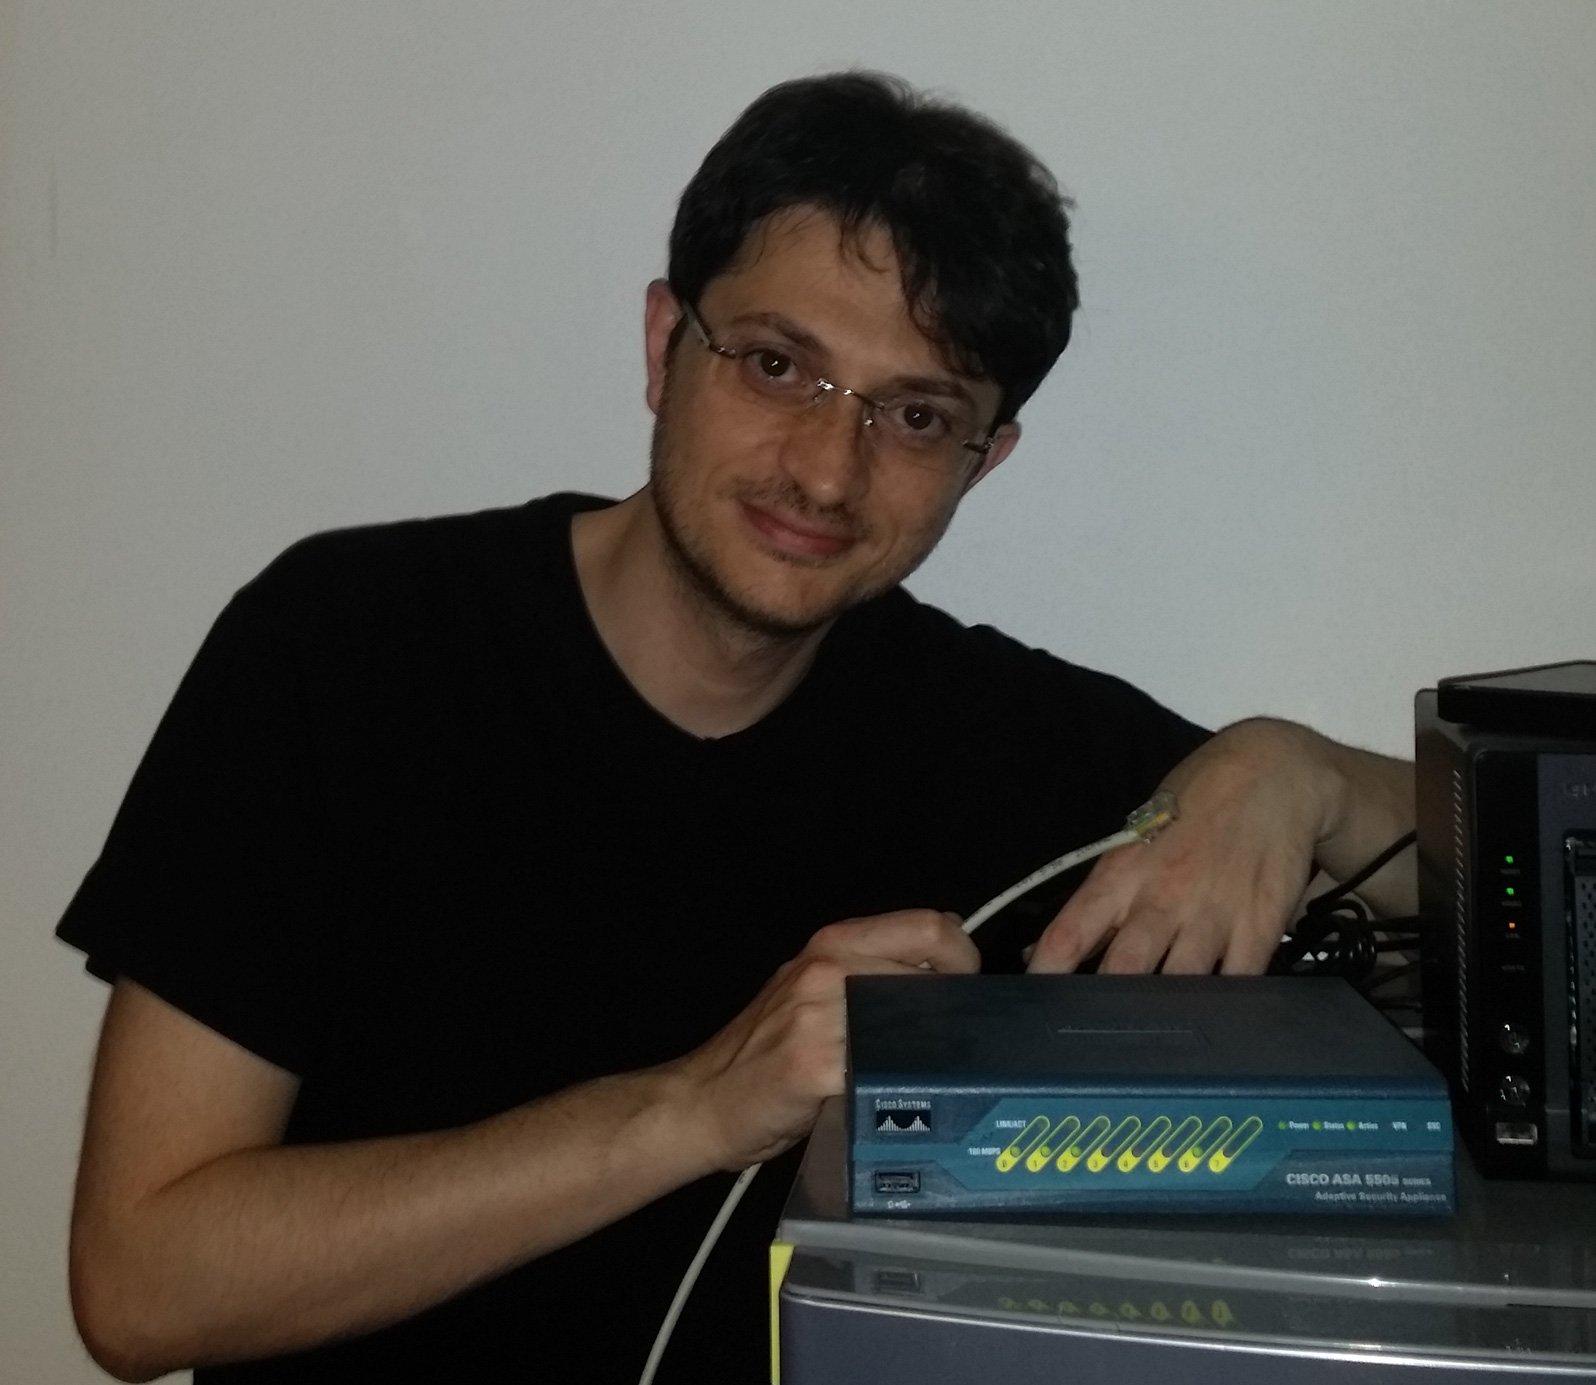 Stefano Laguardia